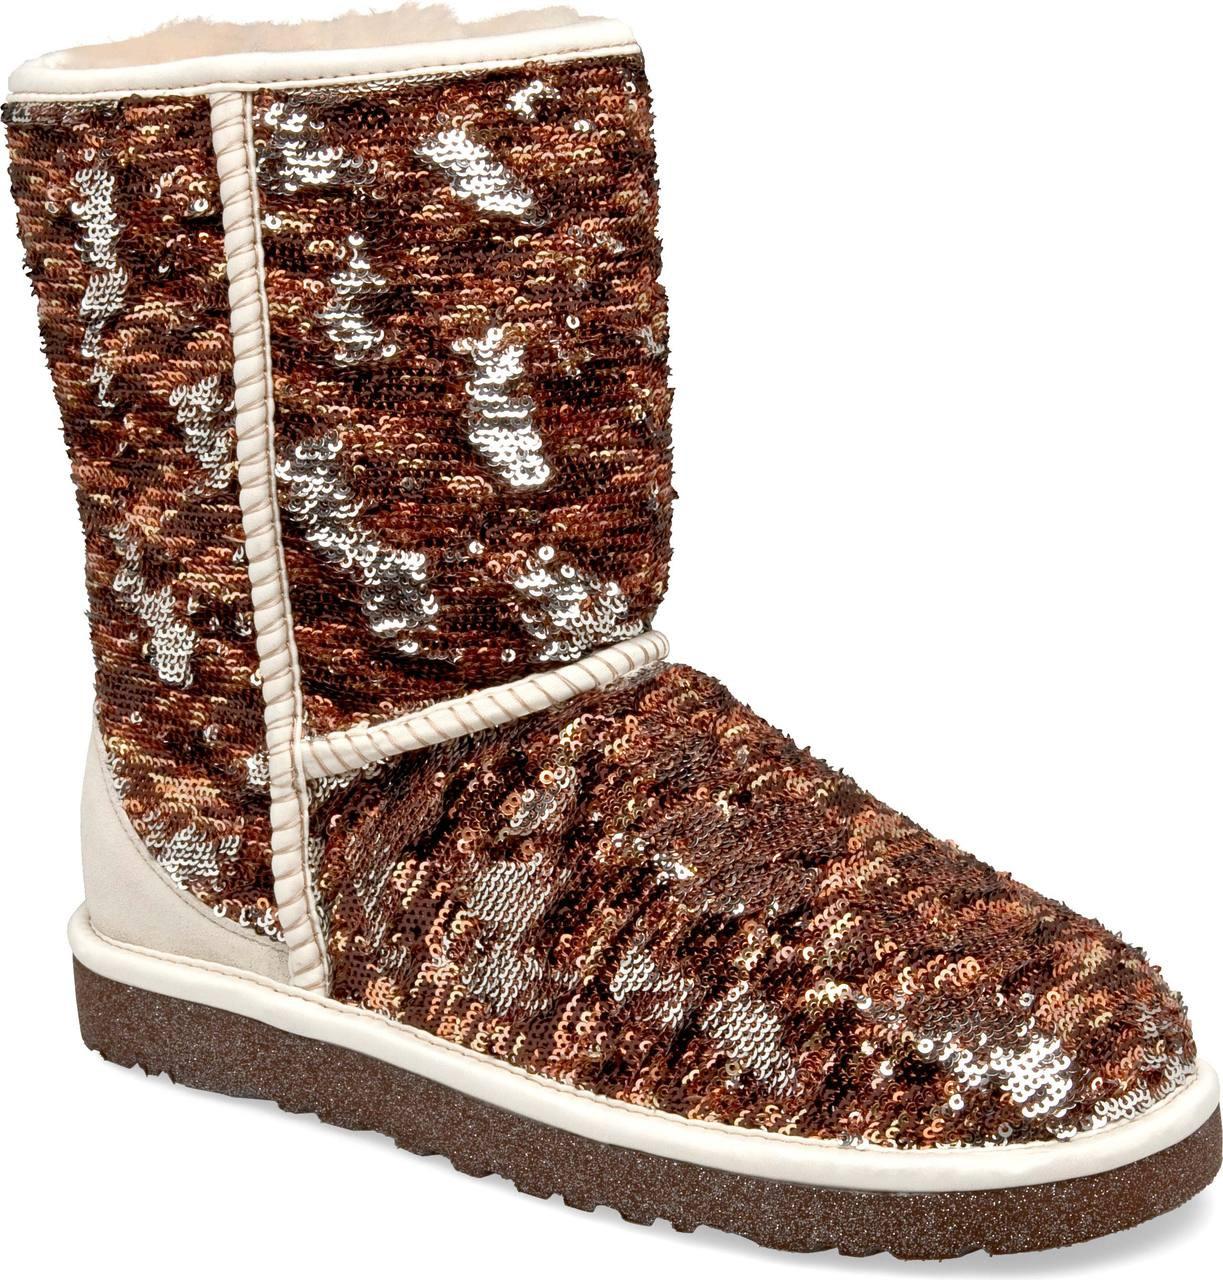 ... Knee Boots; UGG Australia Women's Classic Short Sparkles (Available in  Multiple Colors). Autumn Camo. Autumn Camo; Black; Blue; Champagne ...